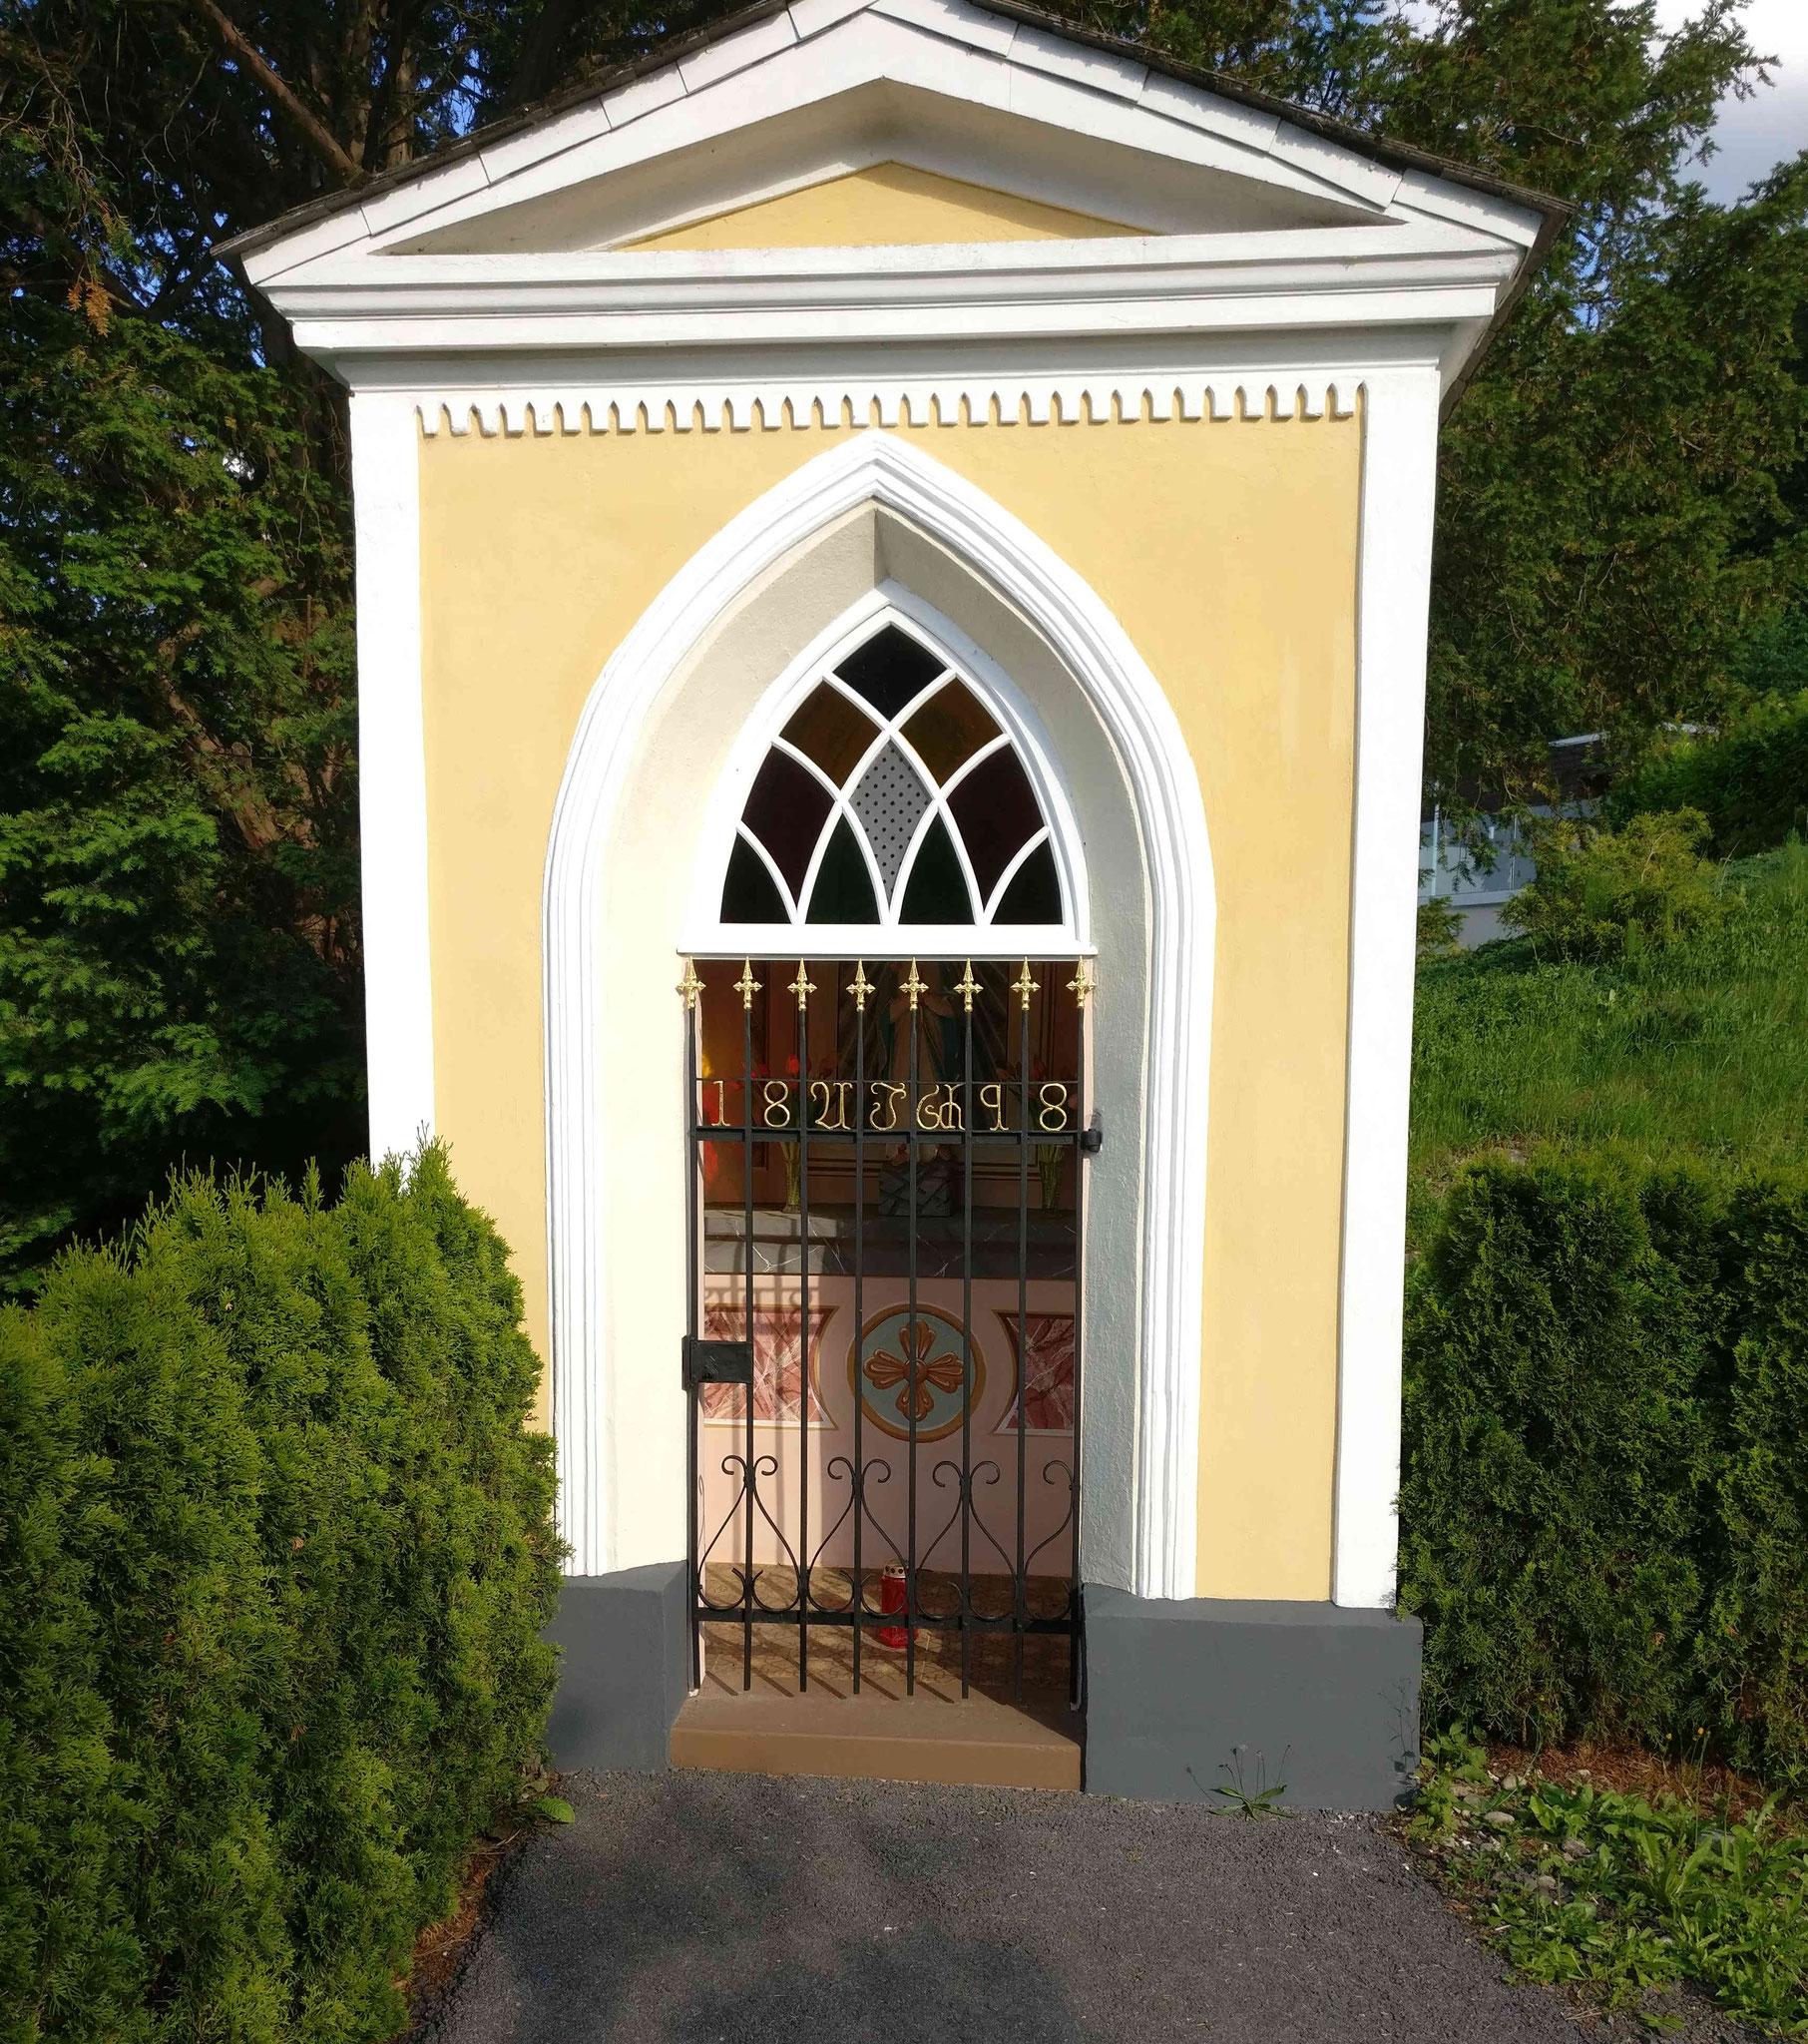 Kappelle neben den Weingärten